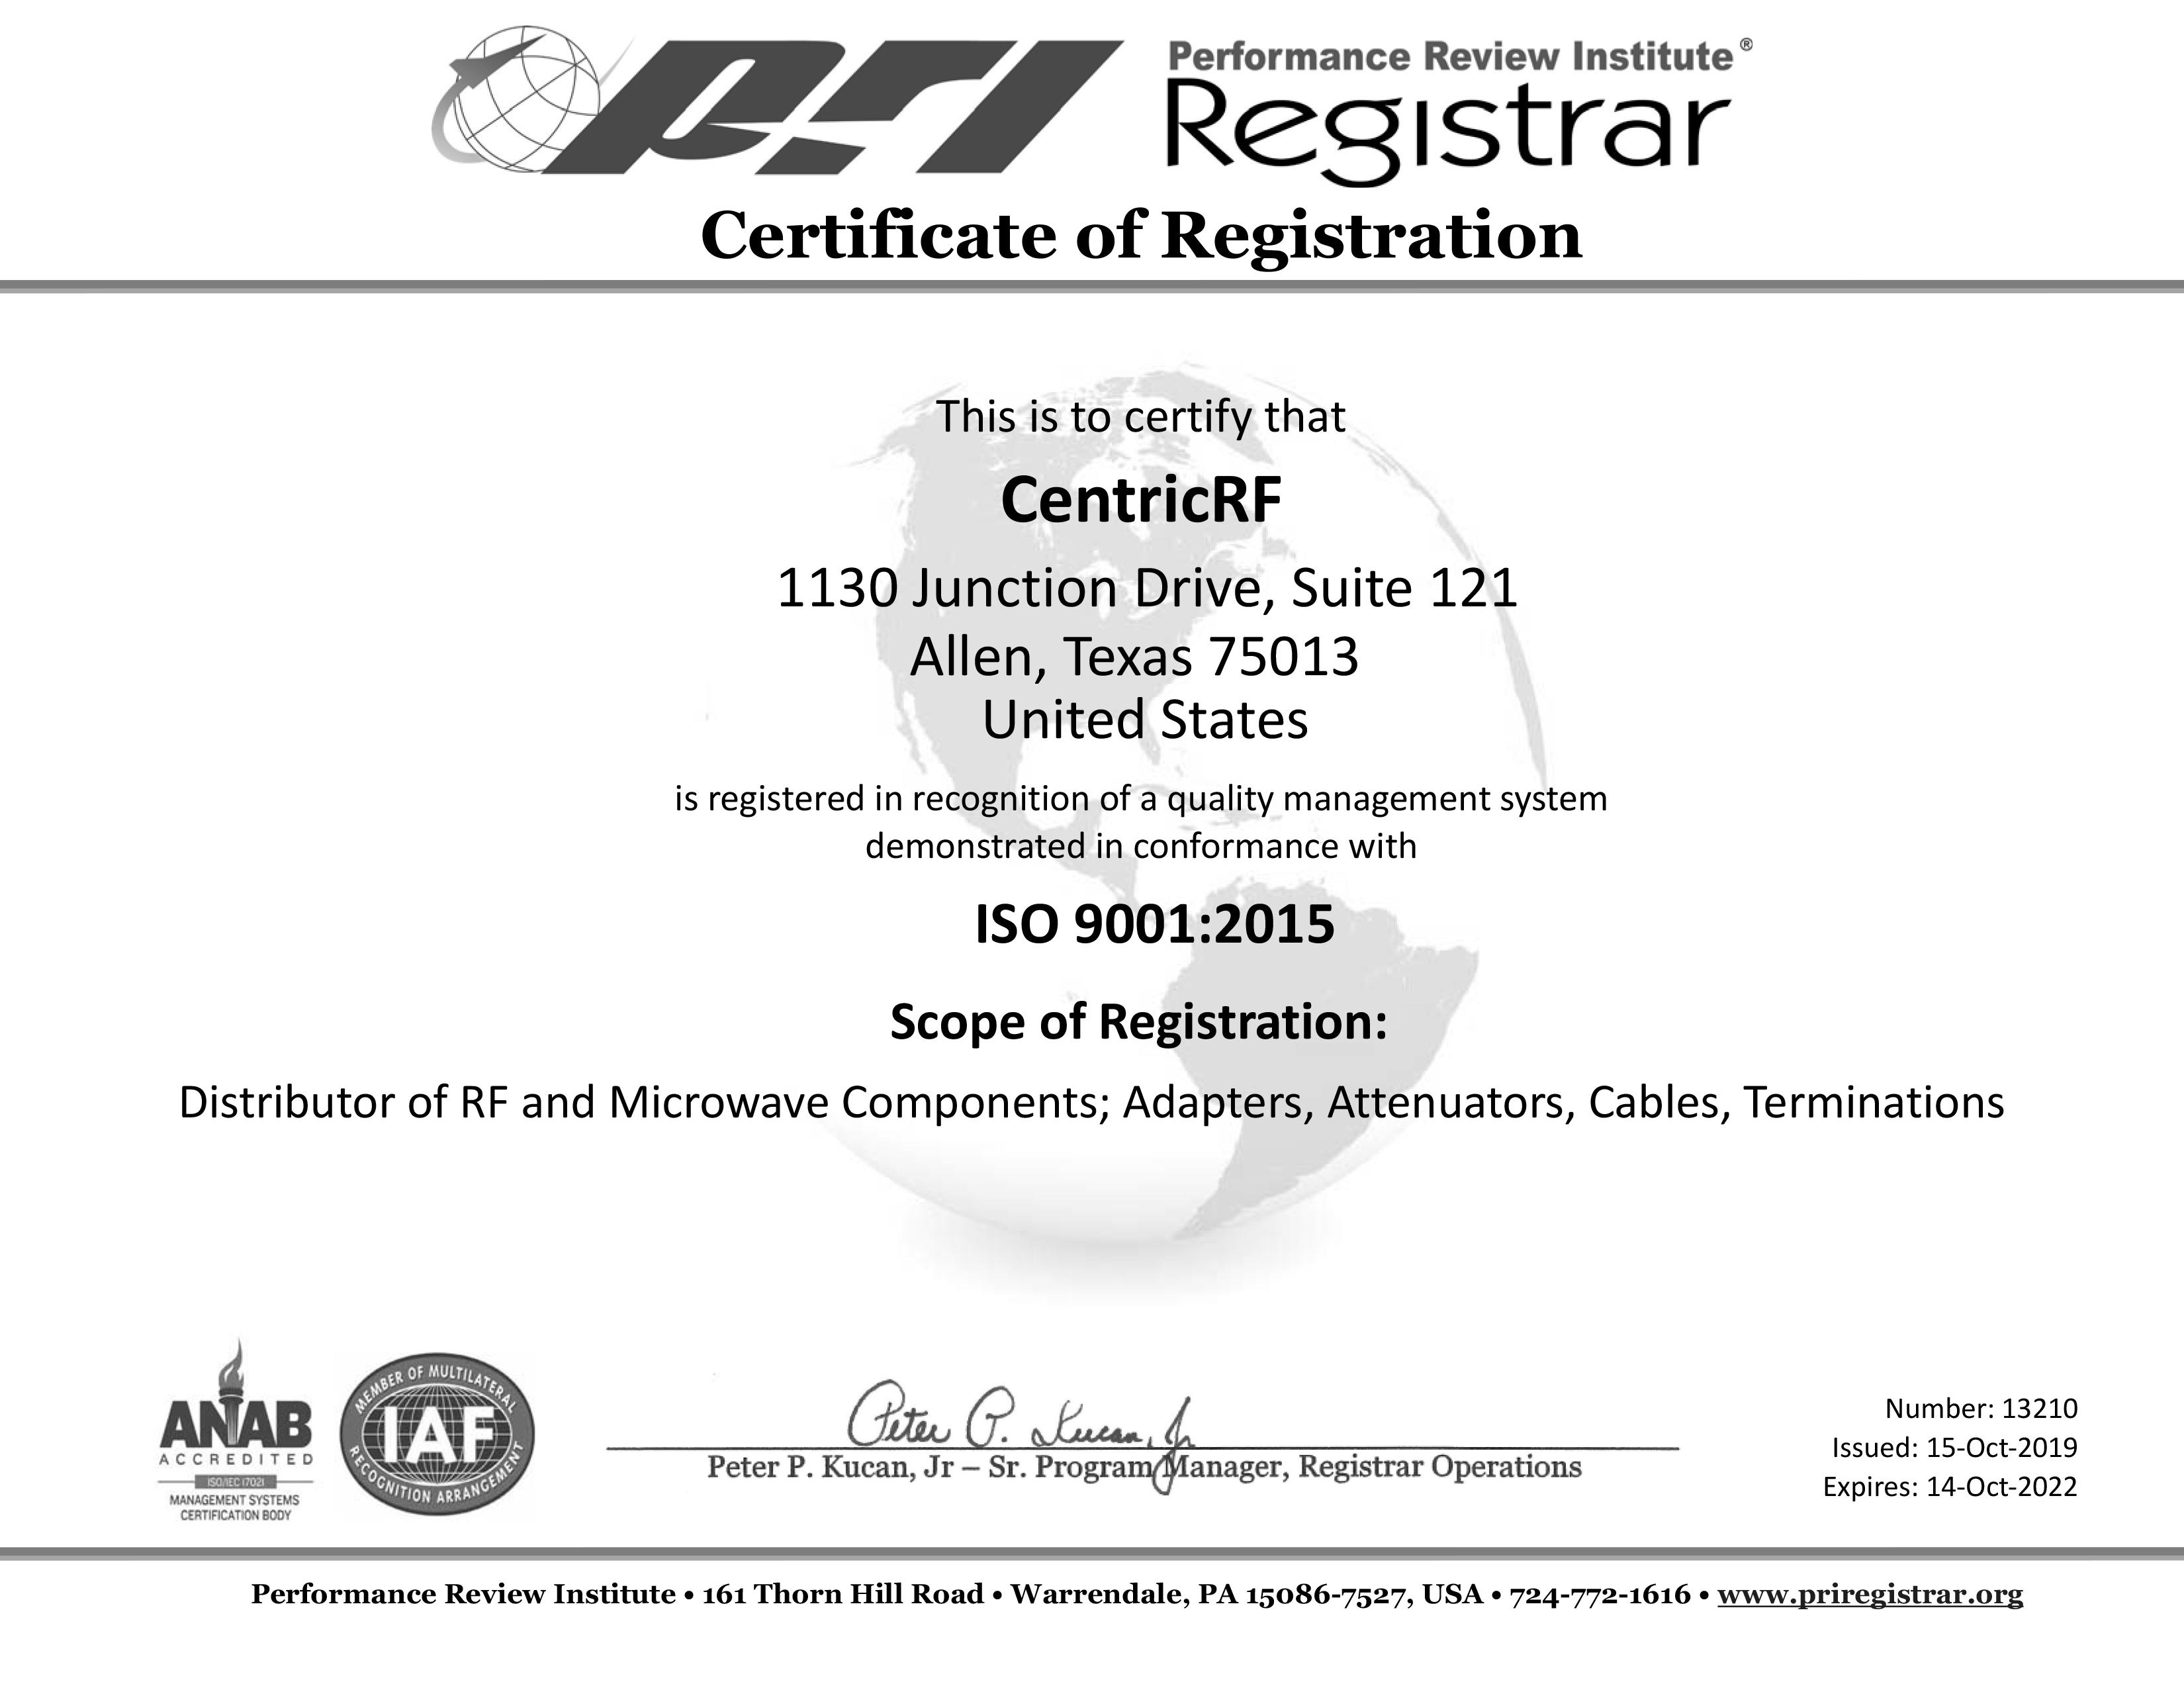 13210-centricrf-15oct2019.jpg